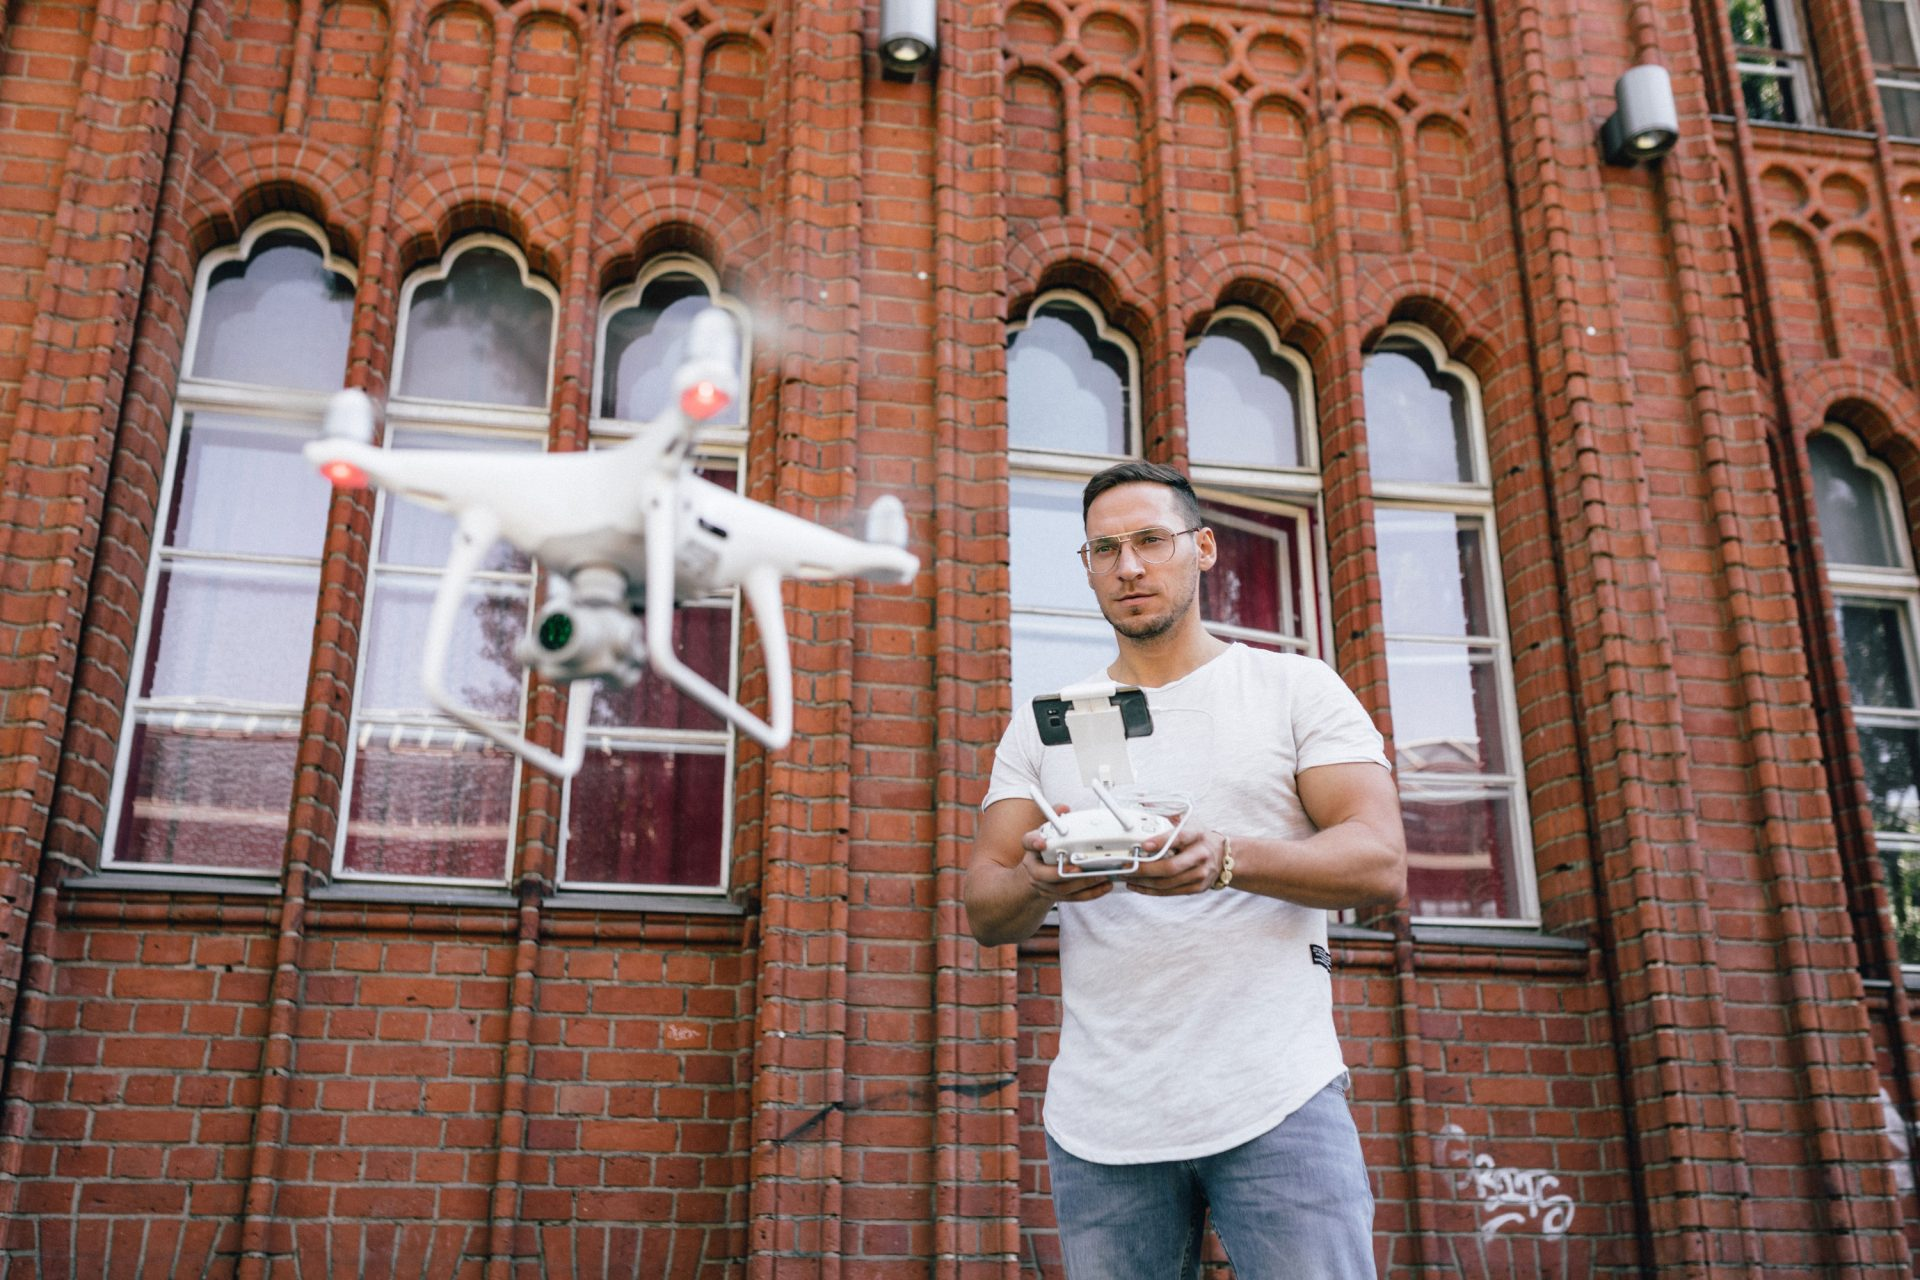 Immobilienfotograf mit Drohne